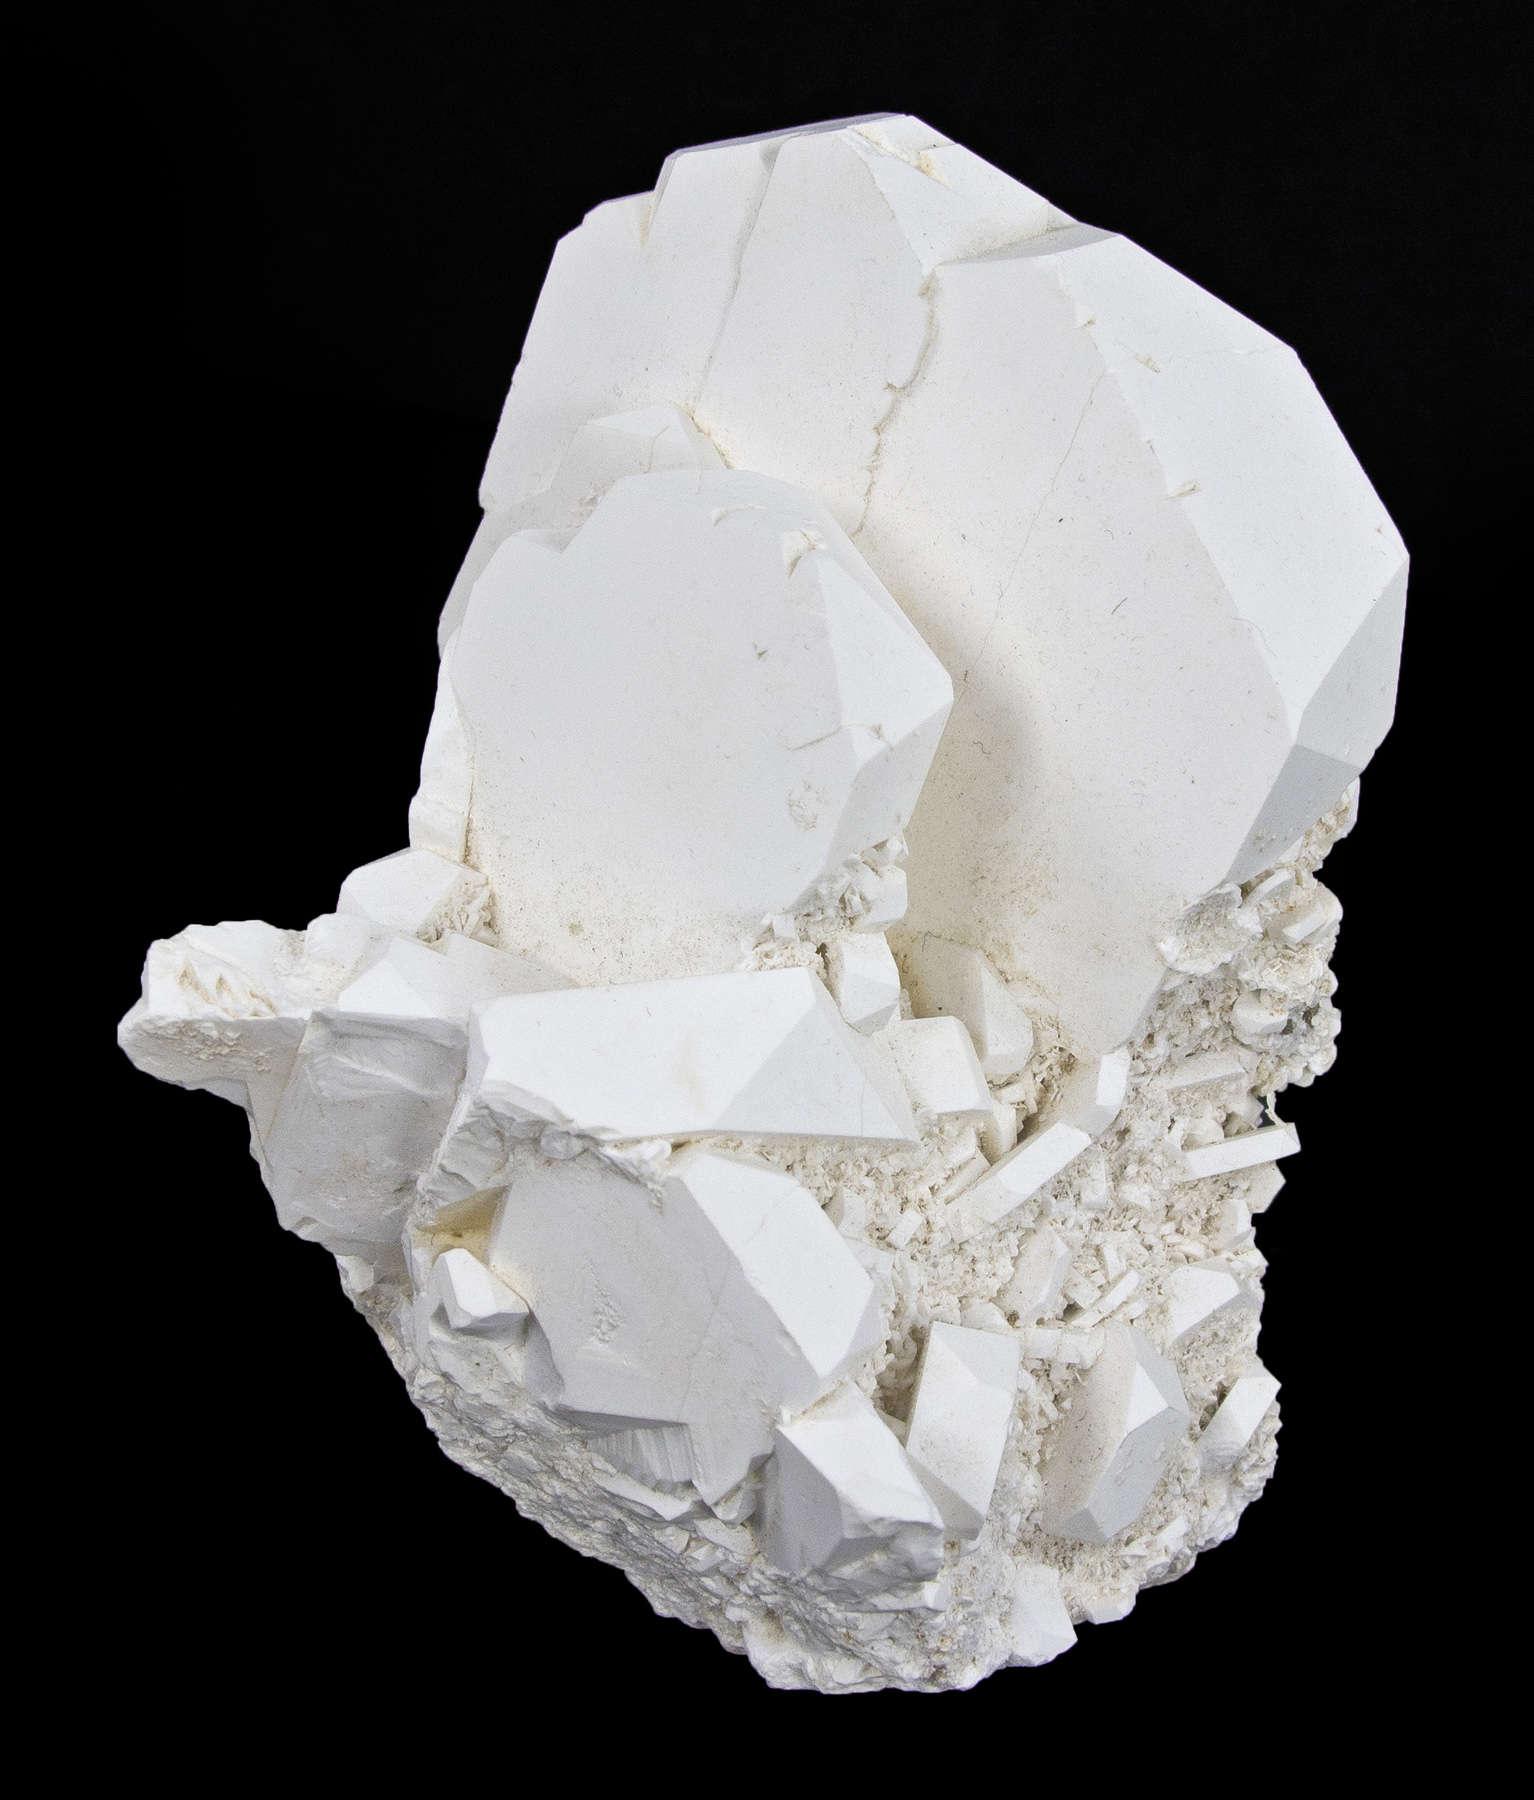 Large Borax Crystals